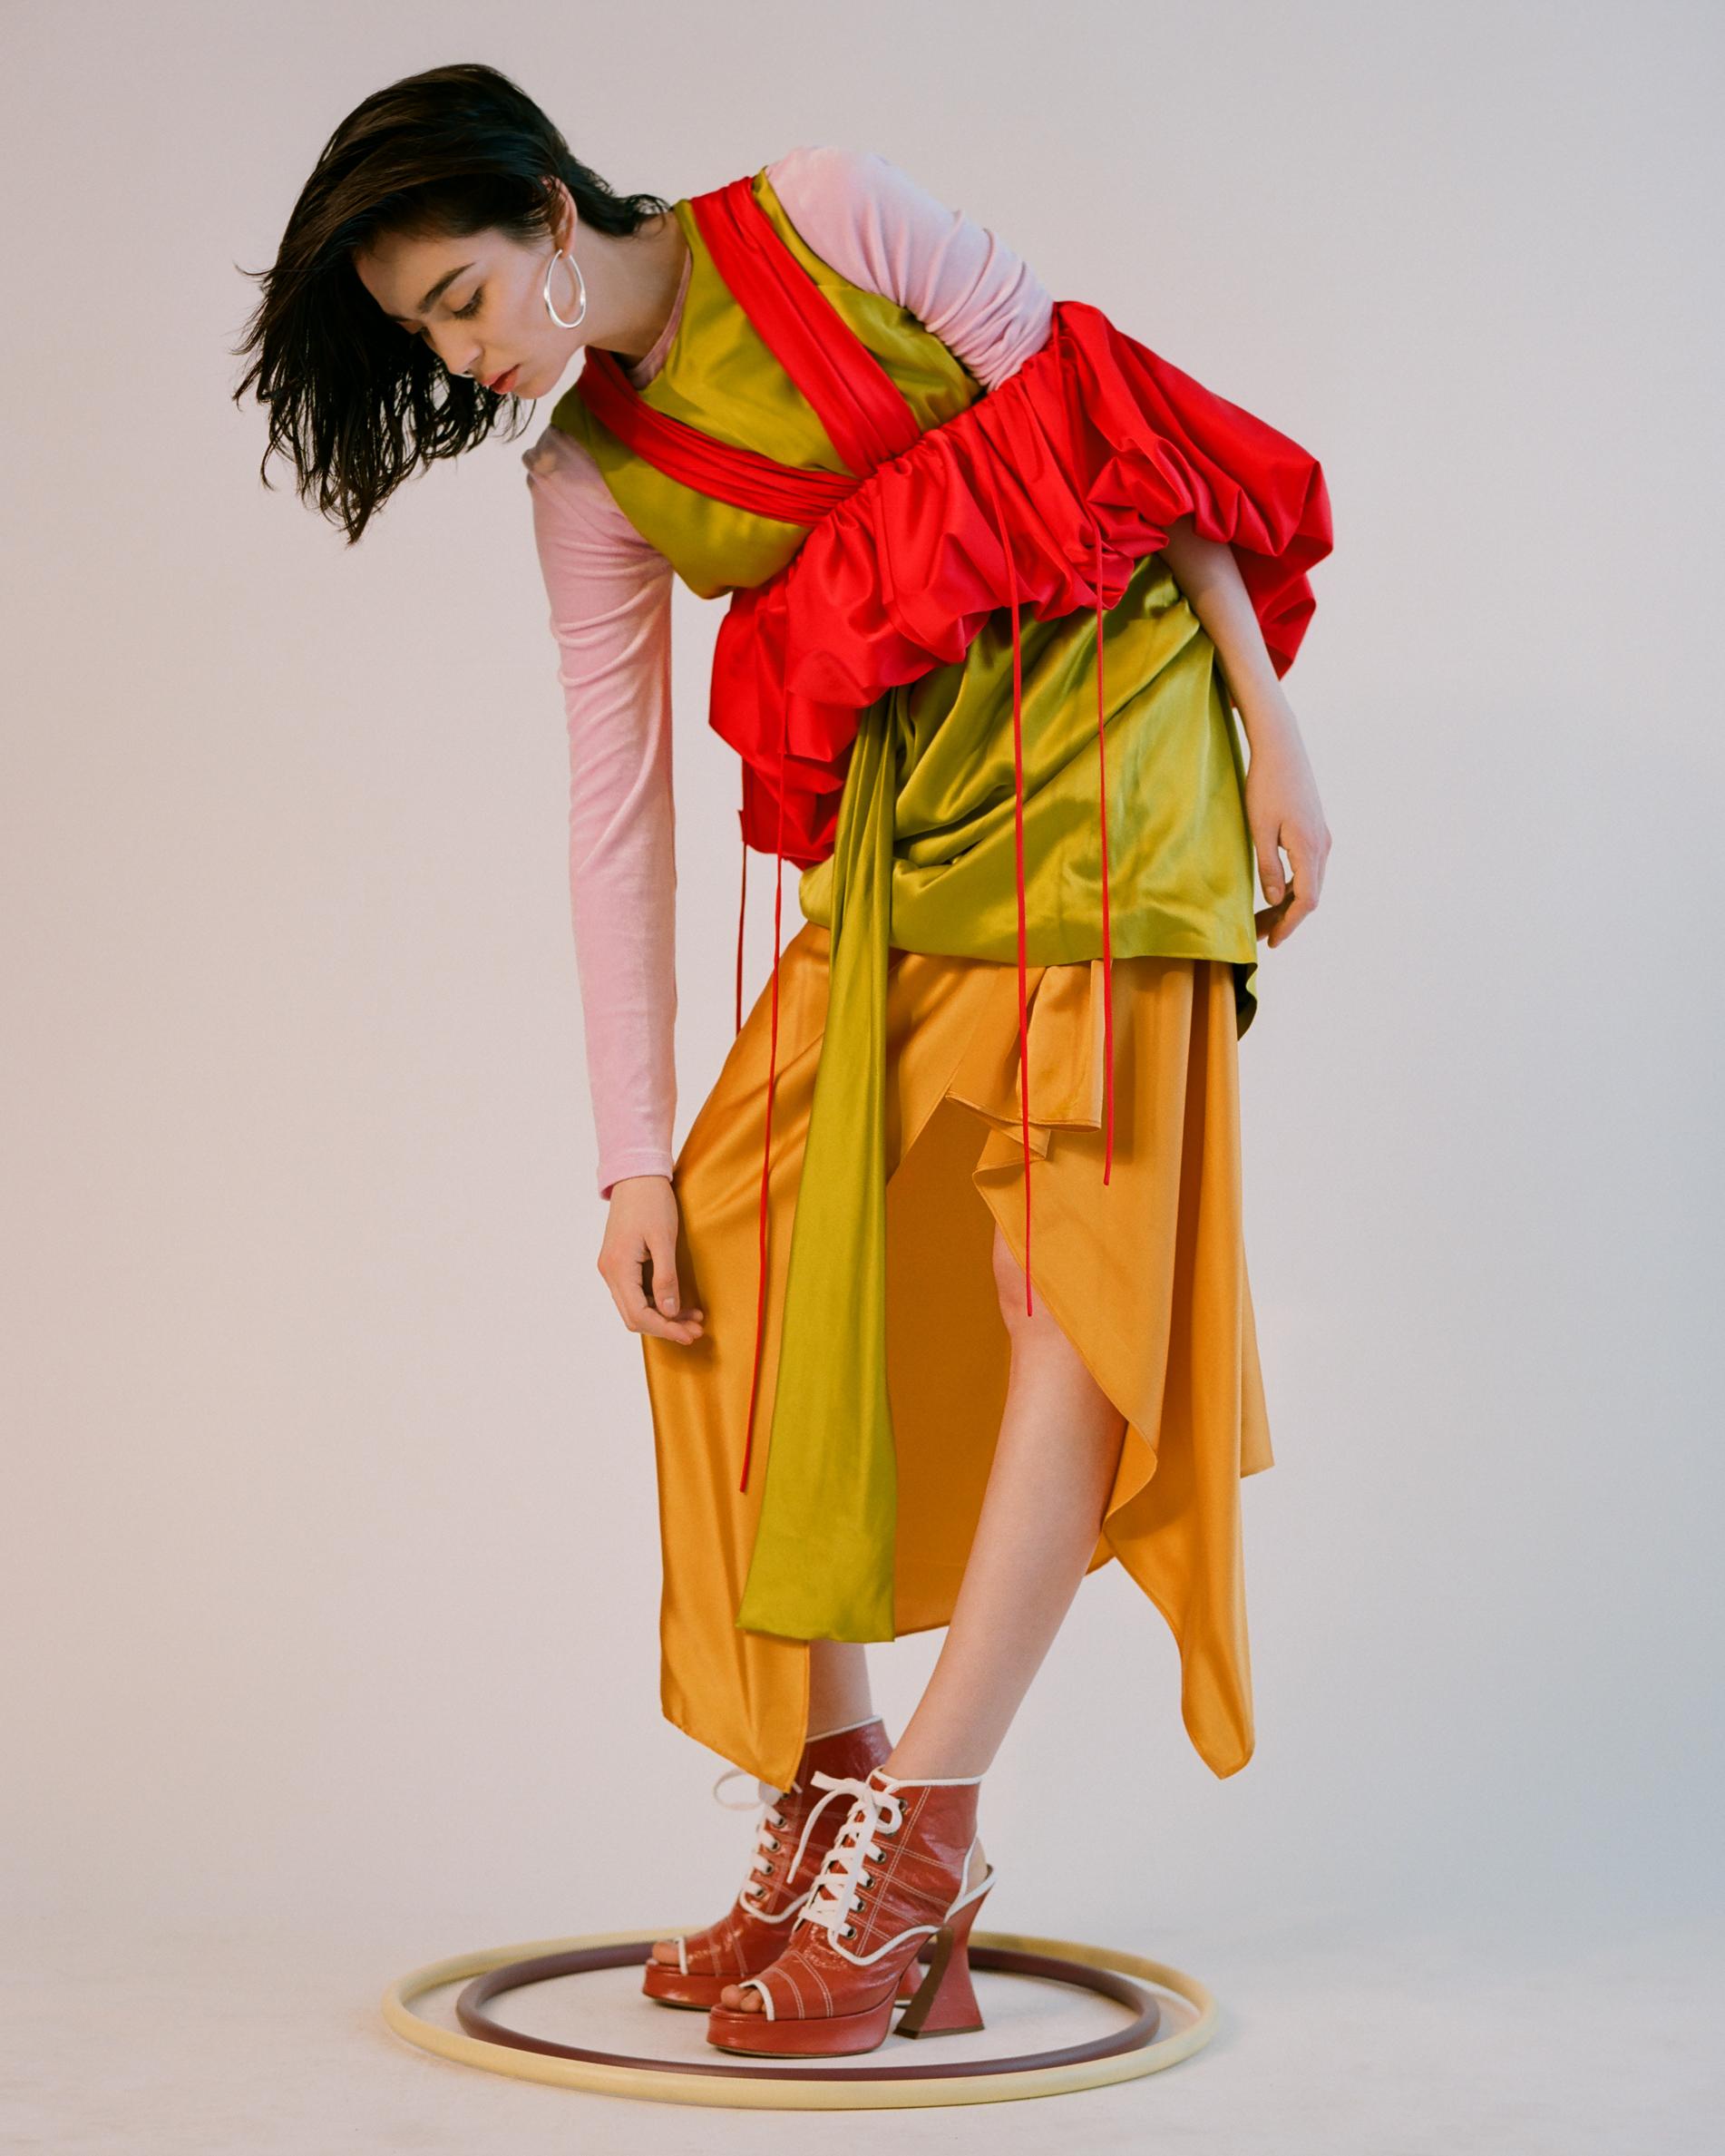 Long sleeve top  BASERANGE Dress  KAMPERETT Top  ROSIE ASSOULIN   Shoes  SIES MARJAN  Earrings  Stylist's Own